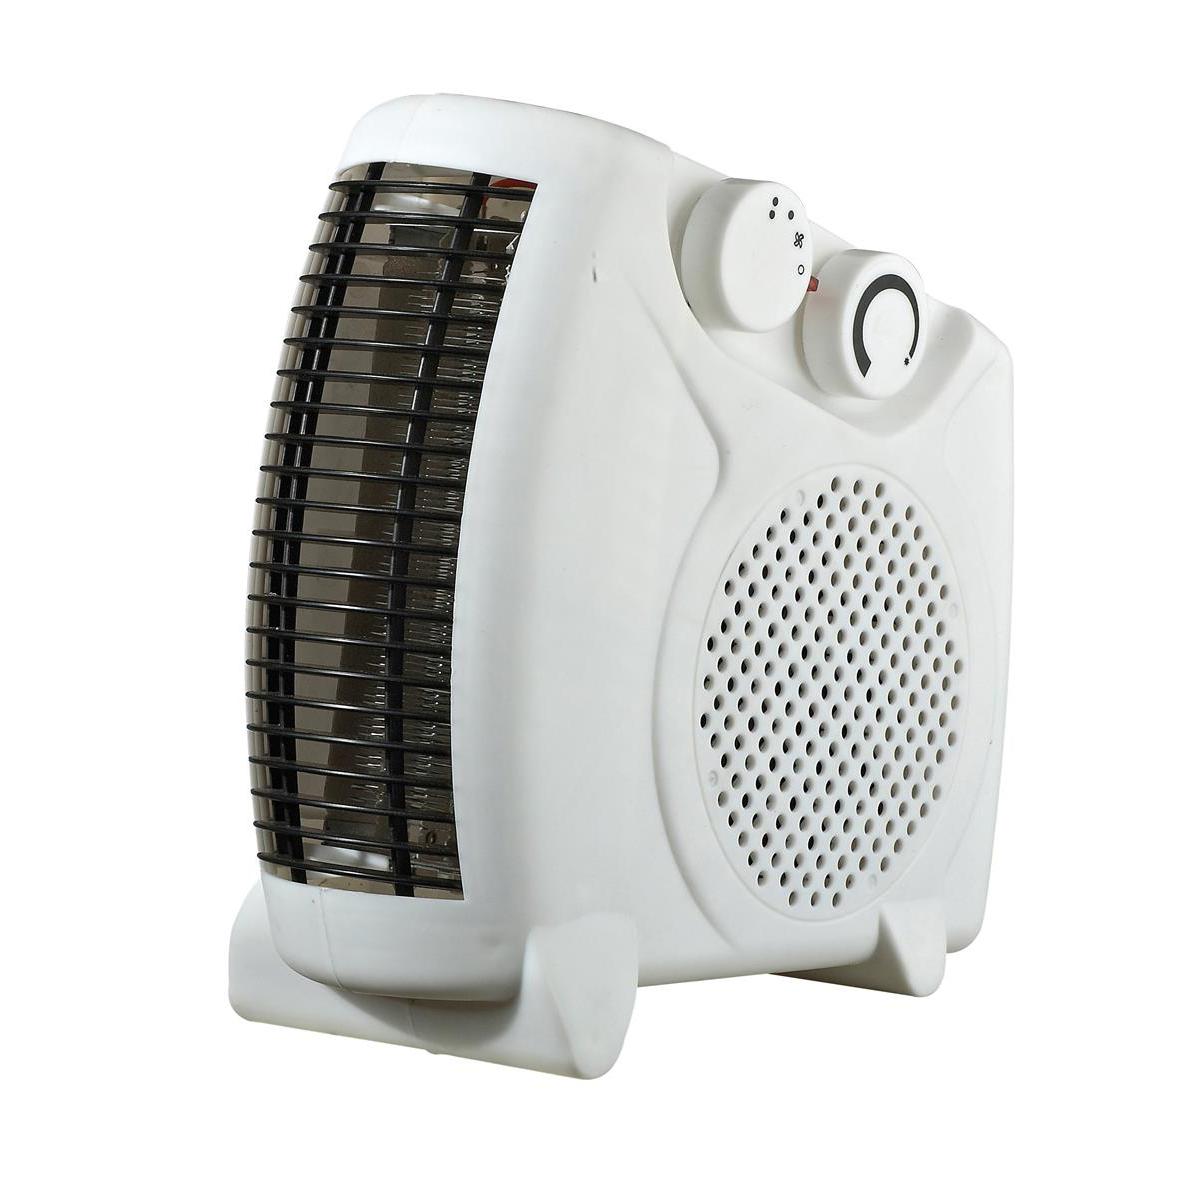 Image for Igenix 2kW Uprigh/Flat Fan Heater White Ref IG9010